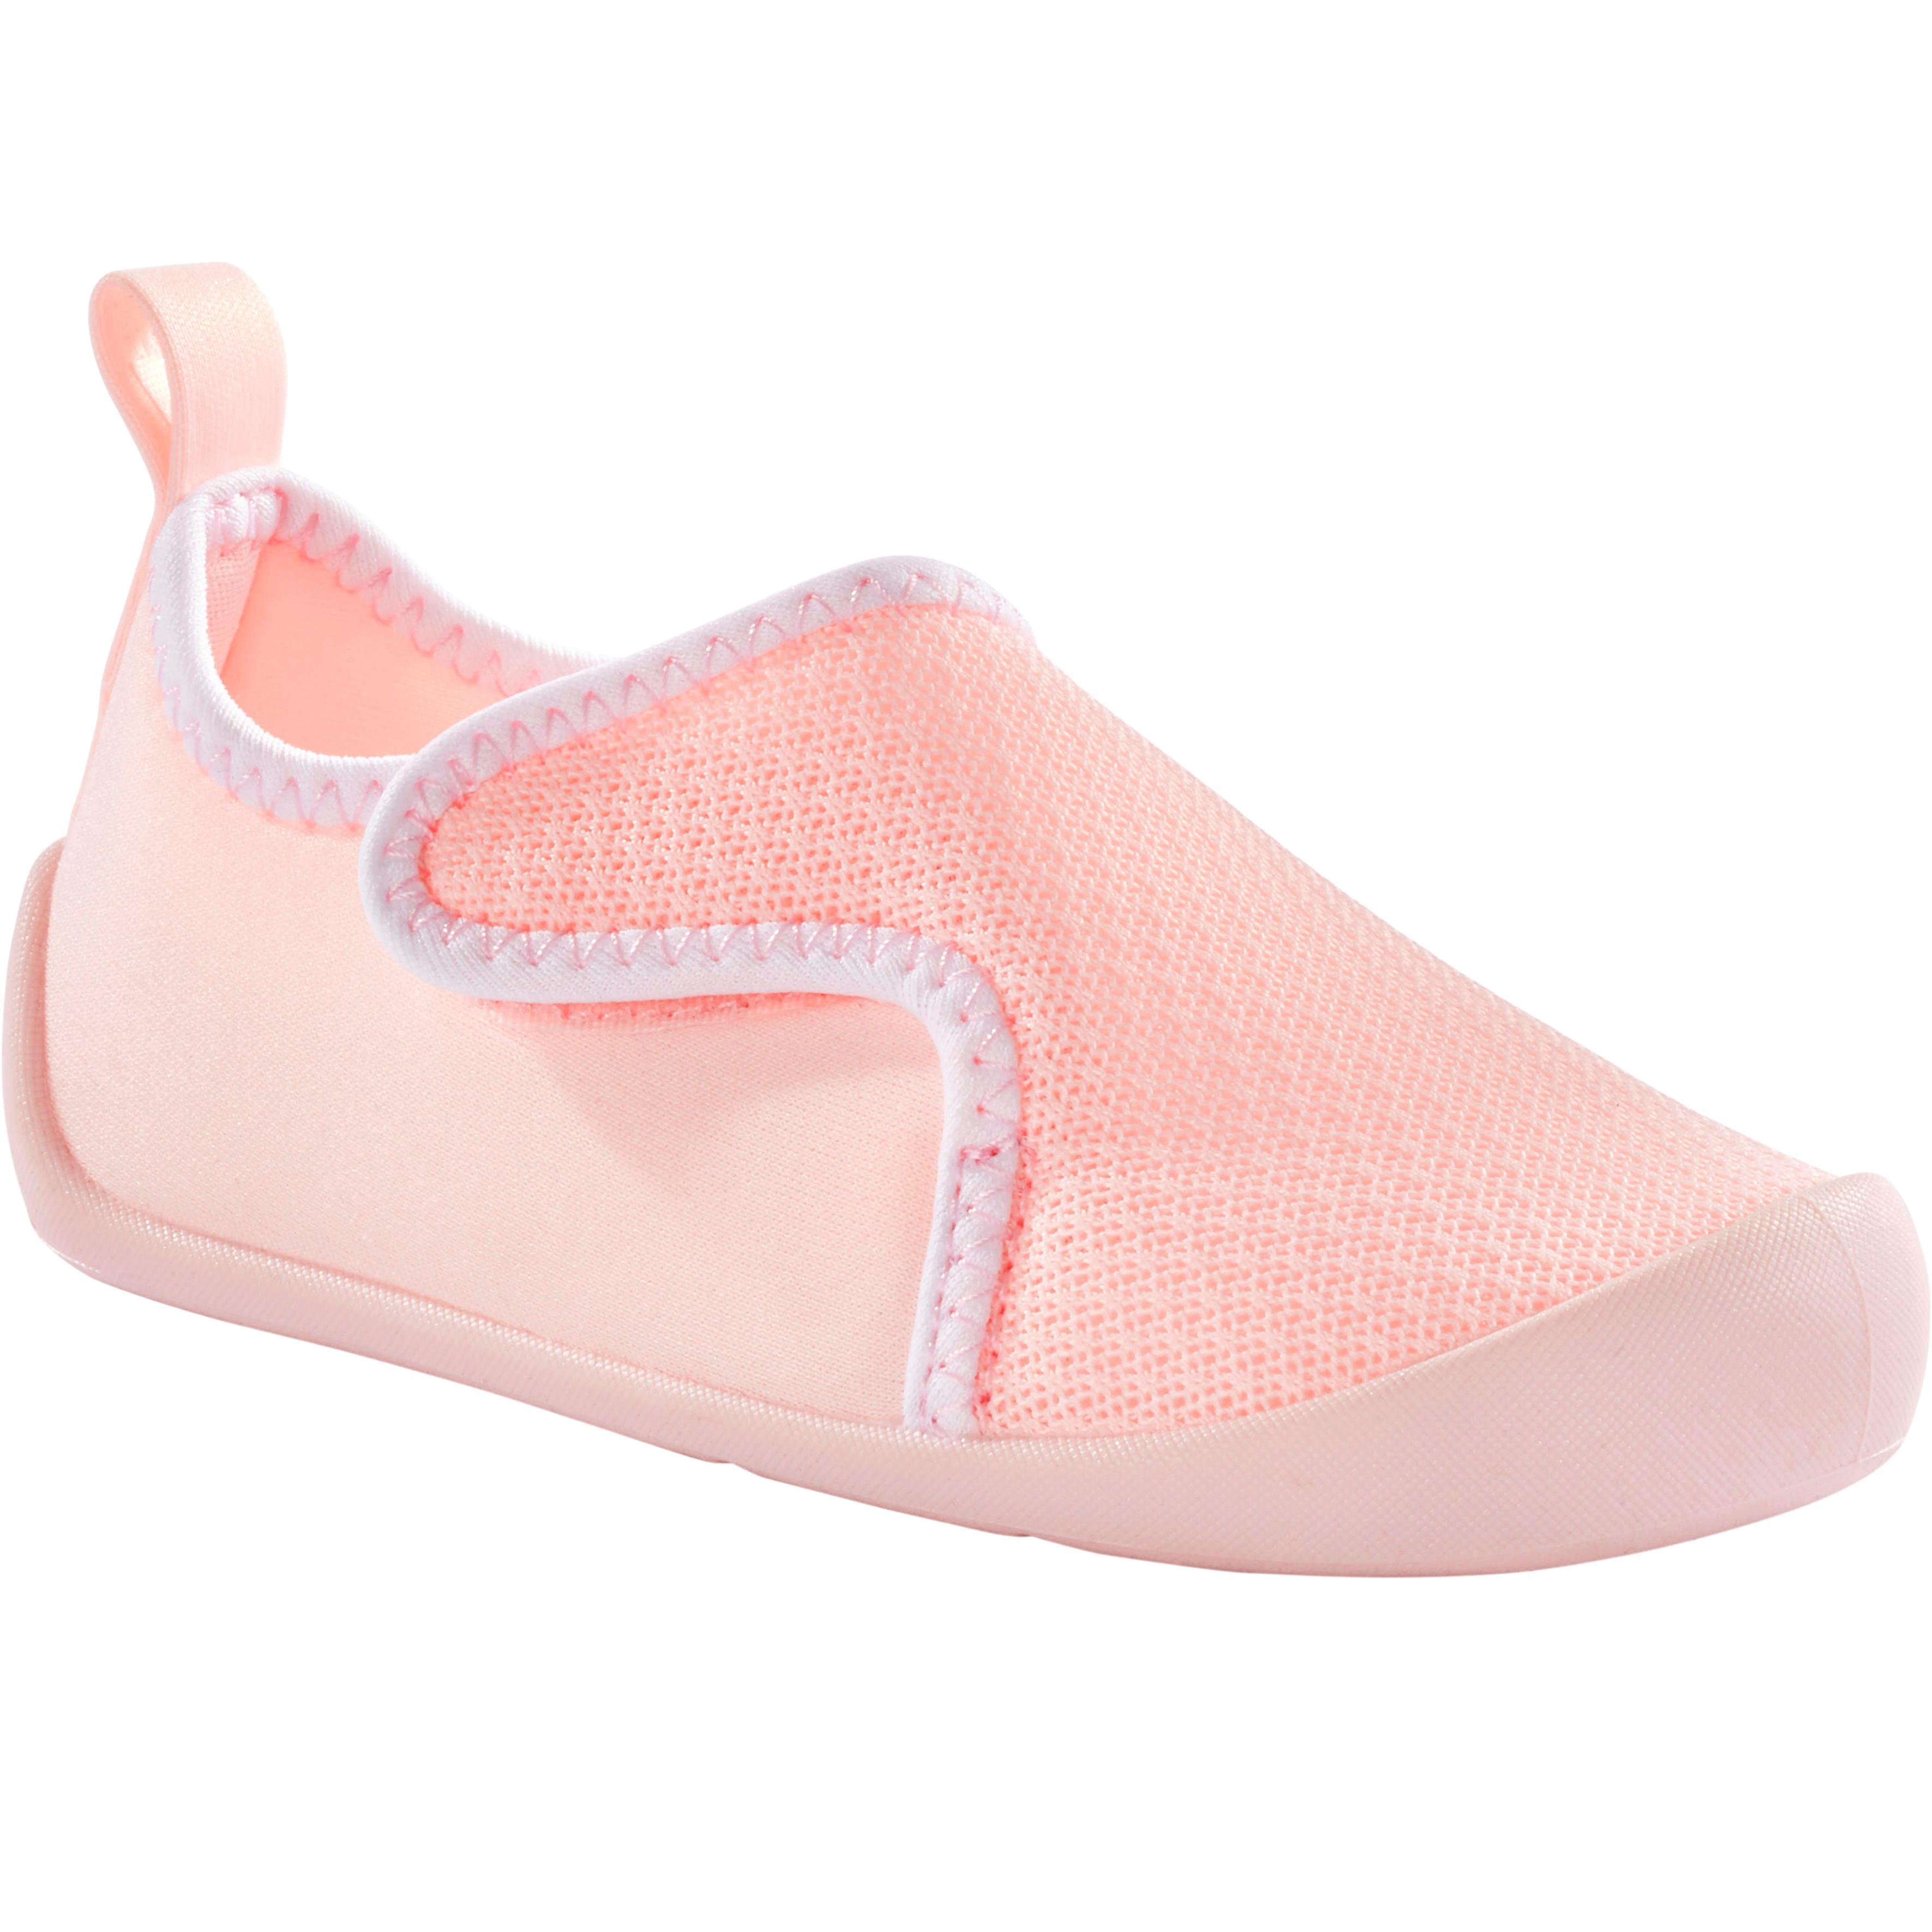 Încălțăminte Baby gym 110 roz